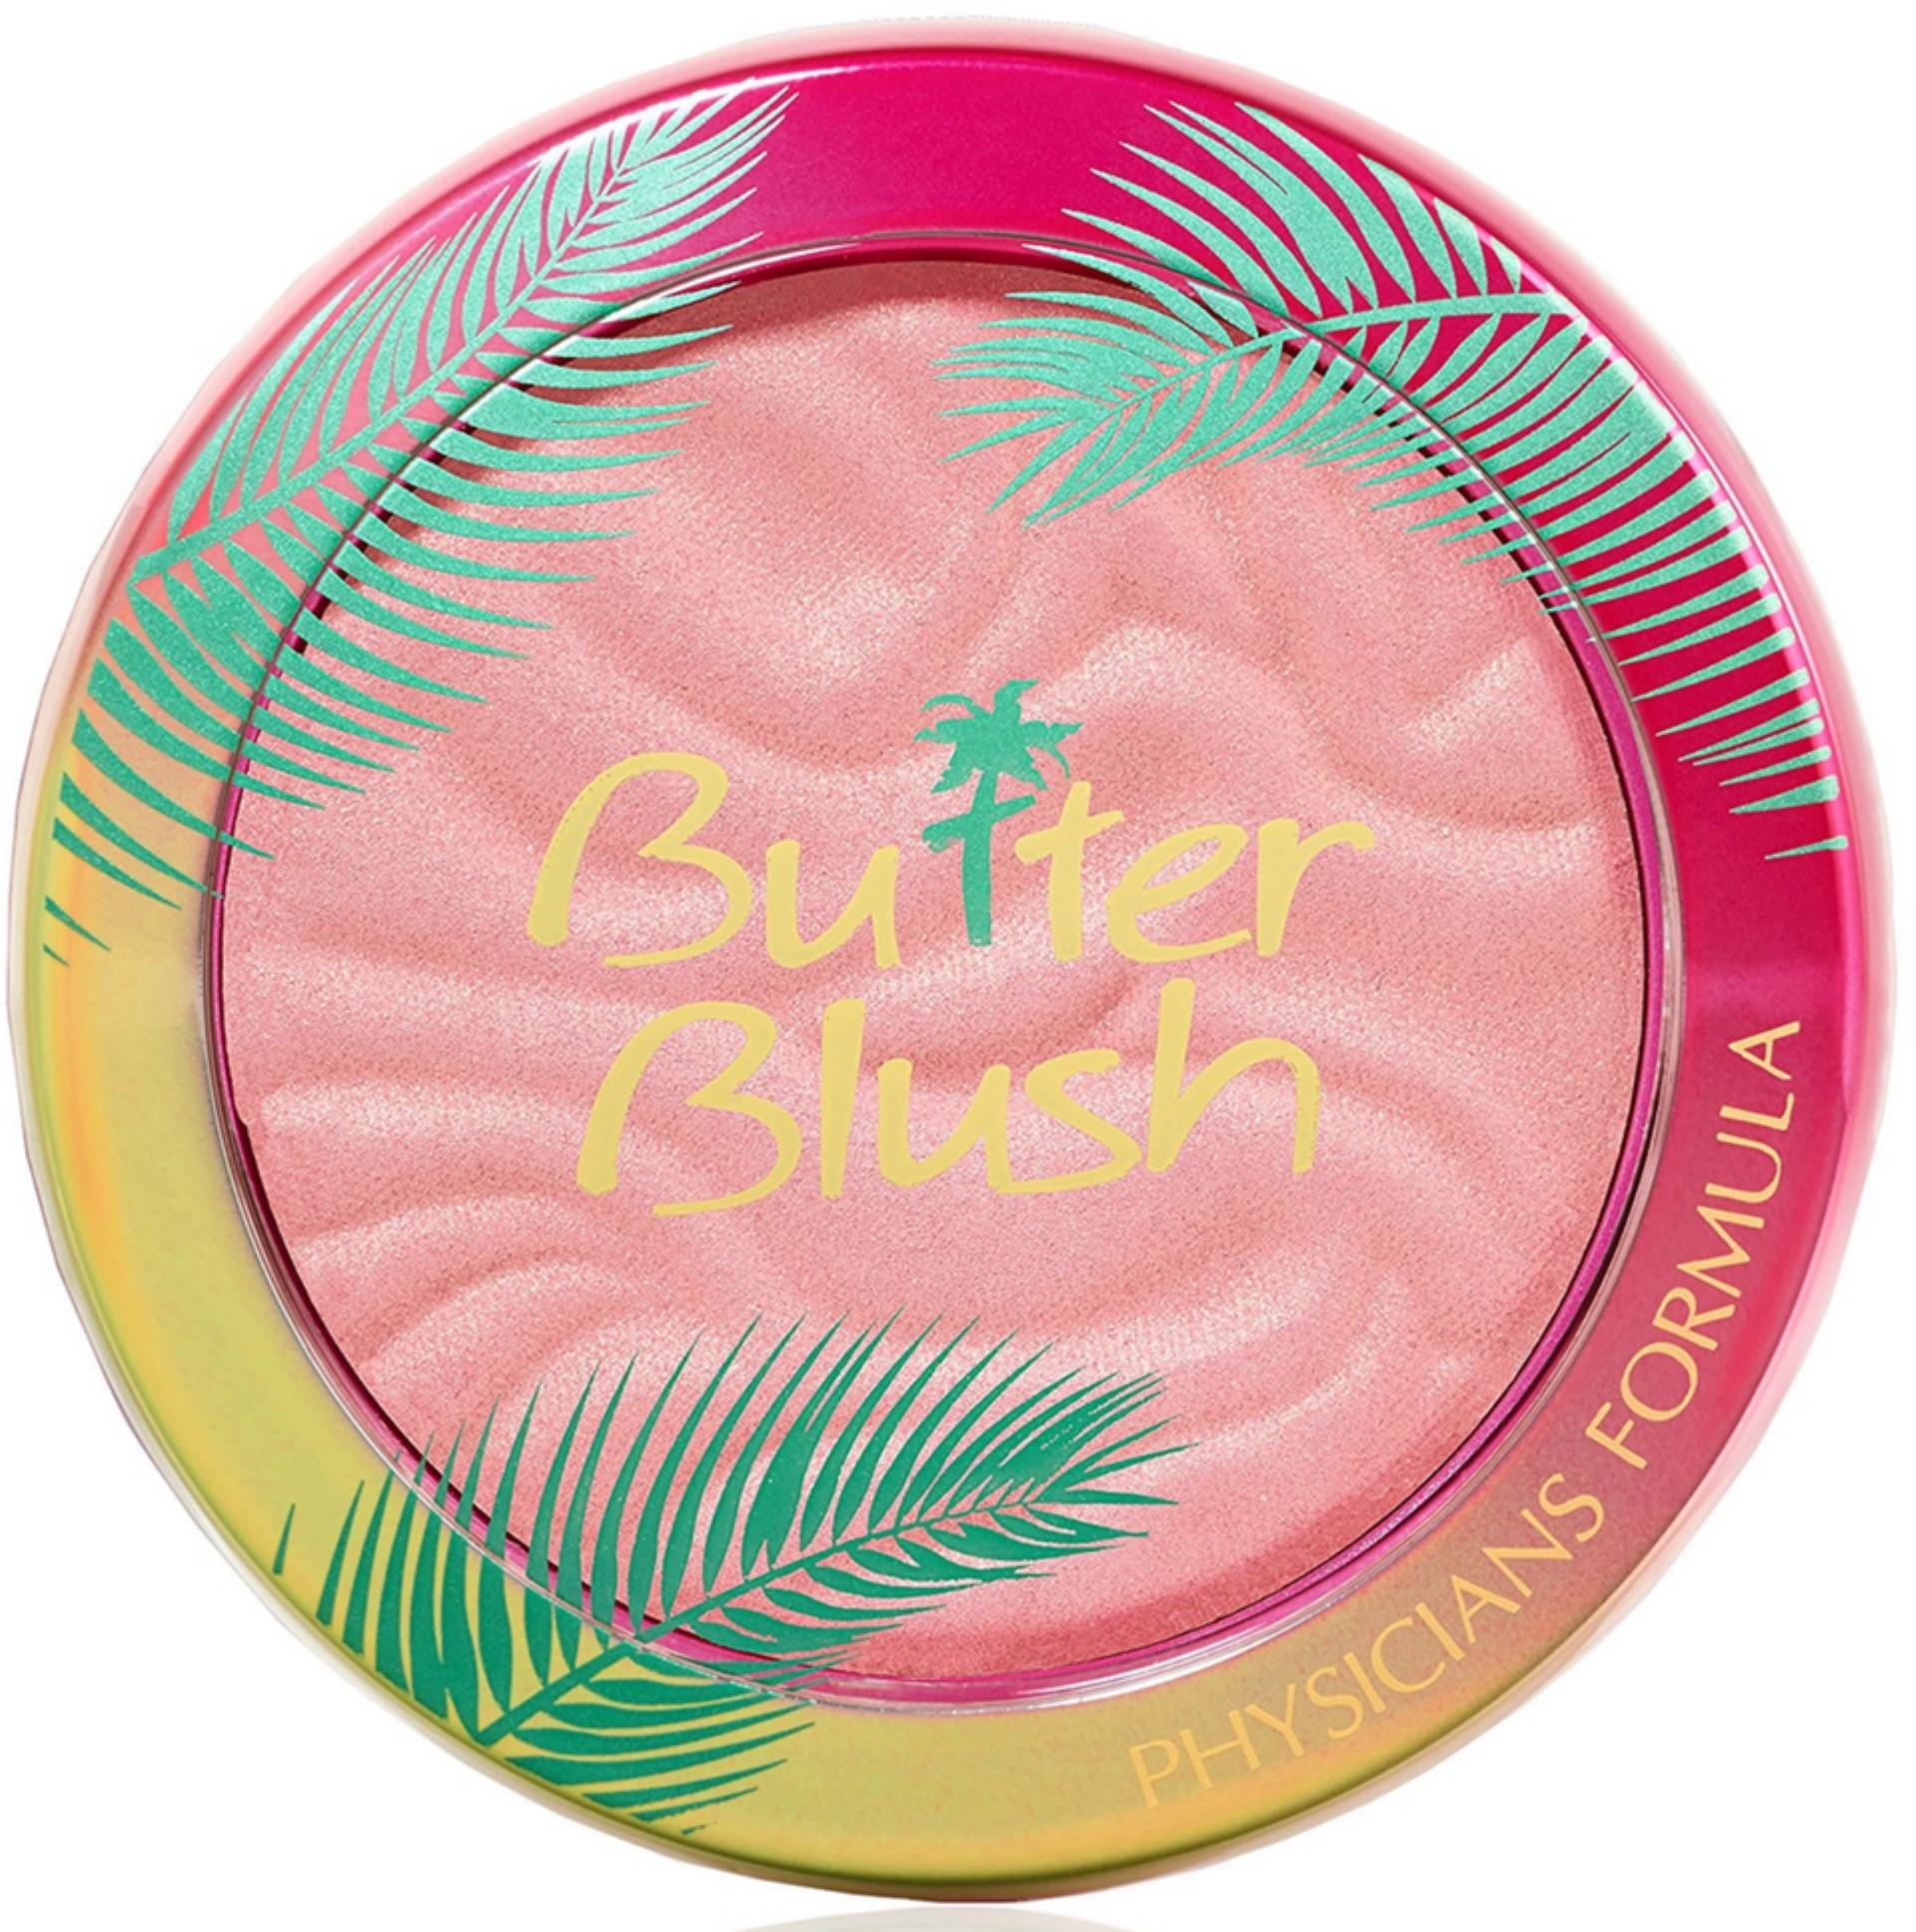 2 Pack - Physician's Formula Murumuru Butter Blush, Natural Glow 0.26 oz